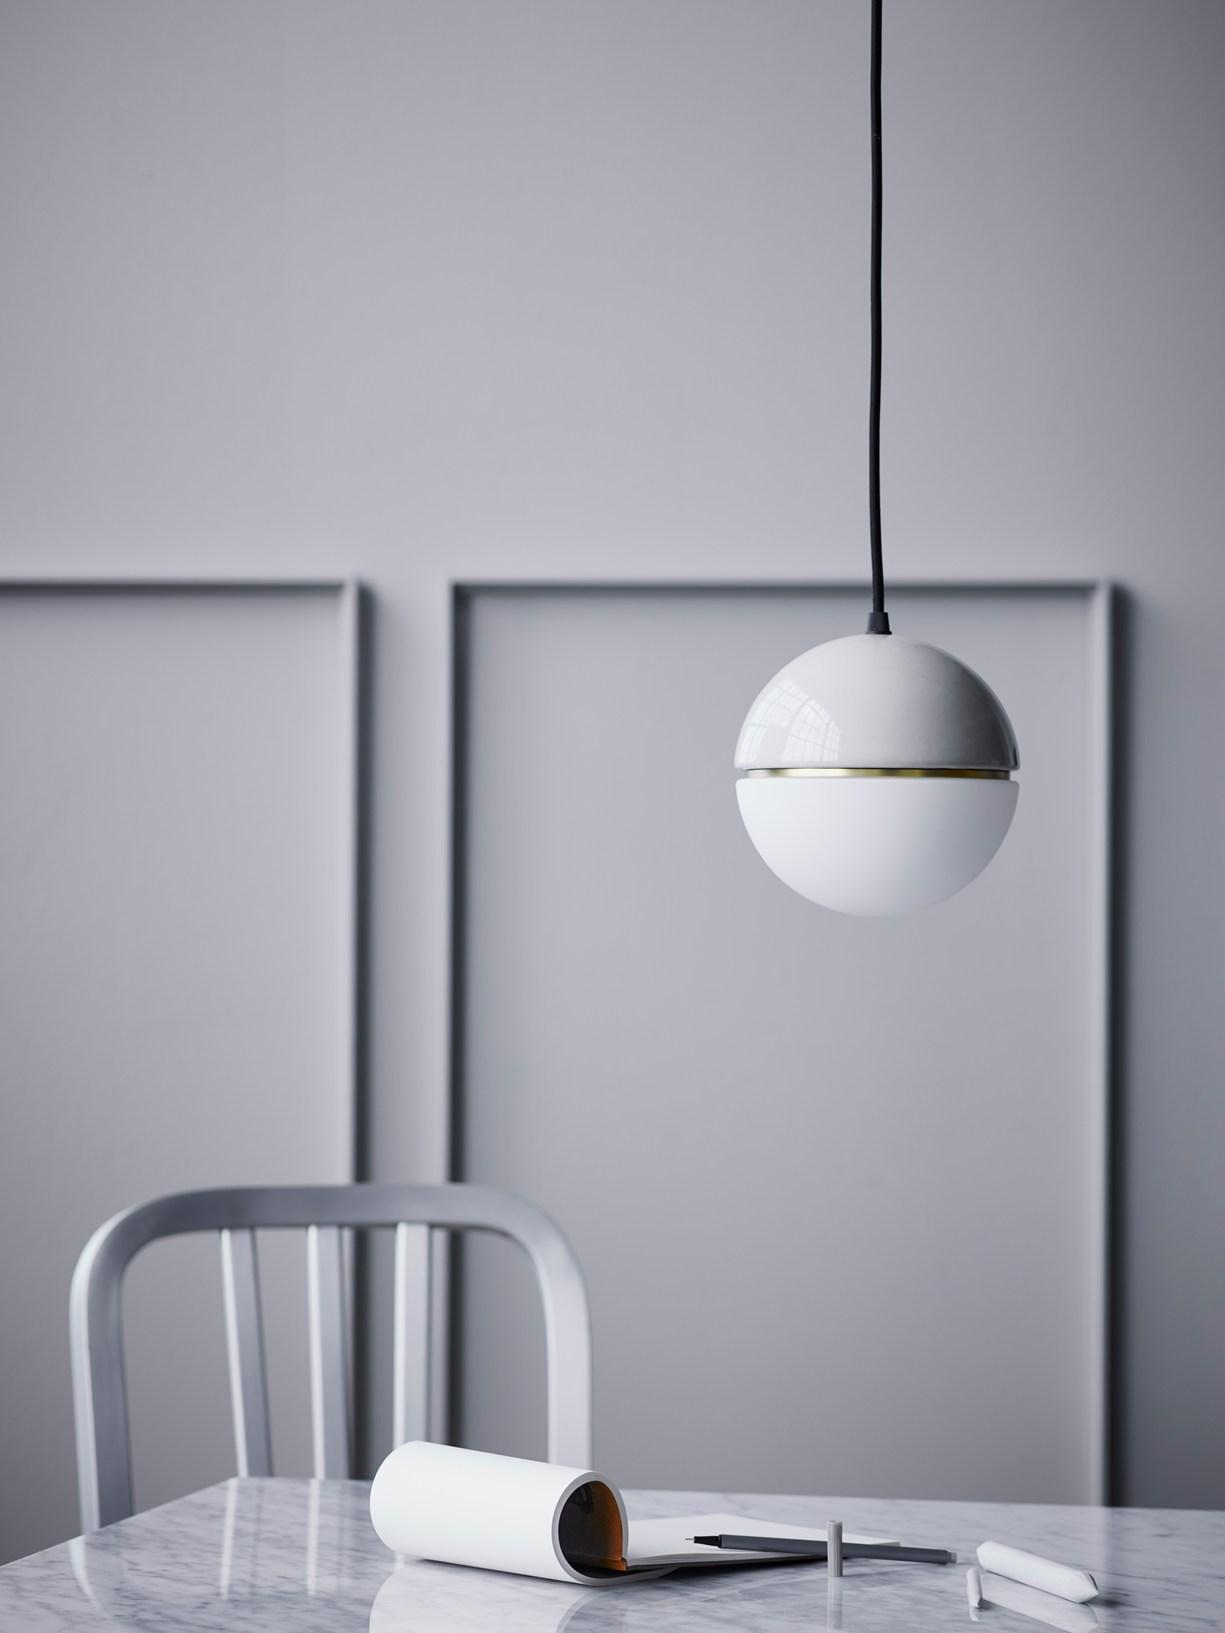 Macaroon Lamp by Christian Troels for Lucie Kaas